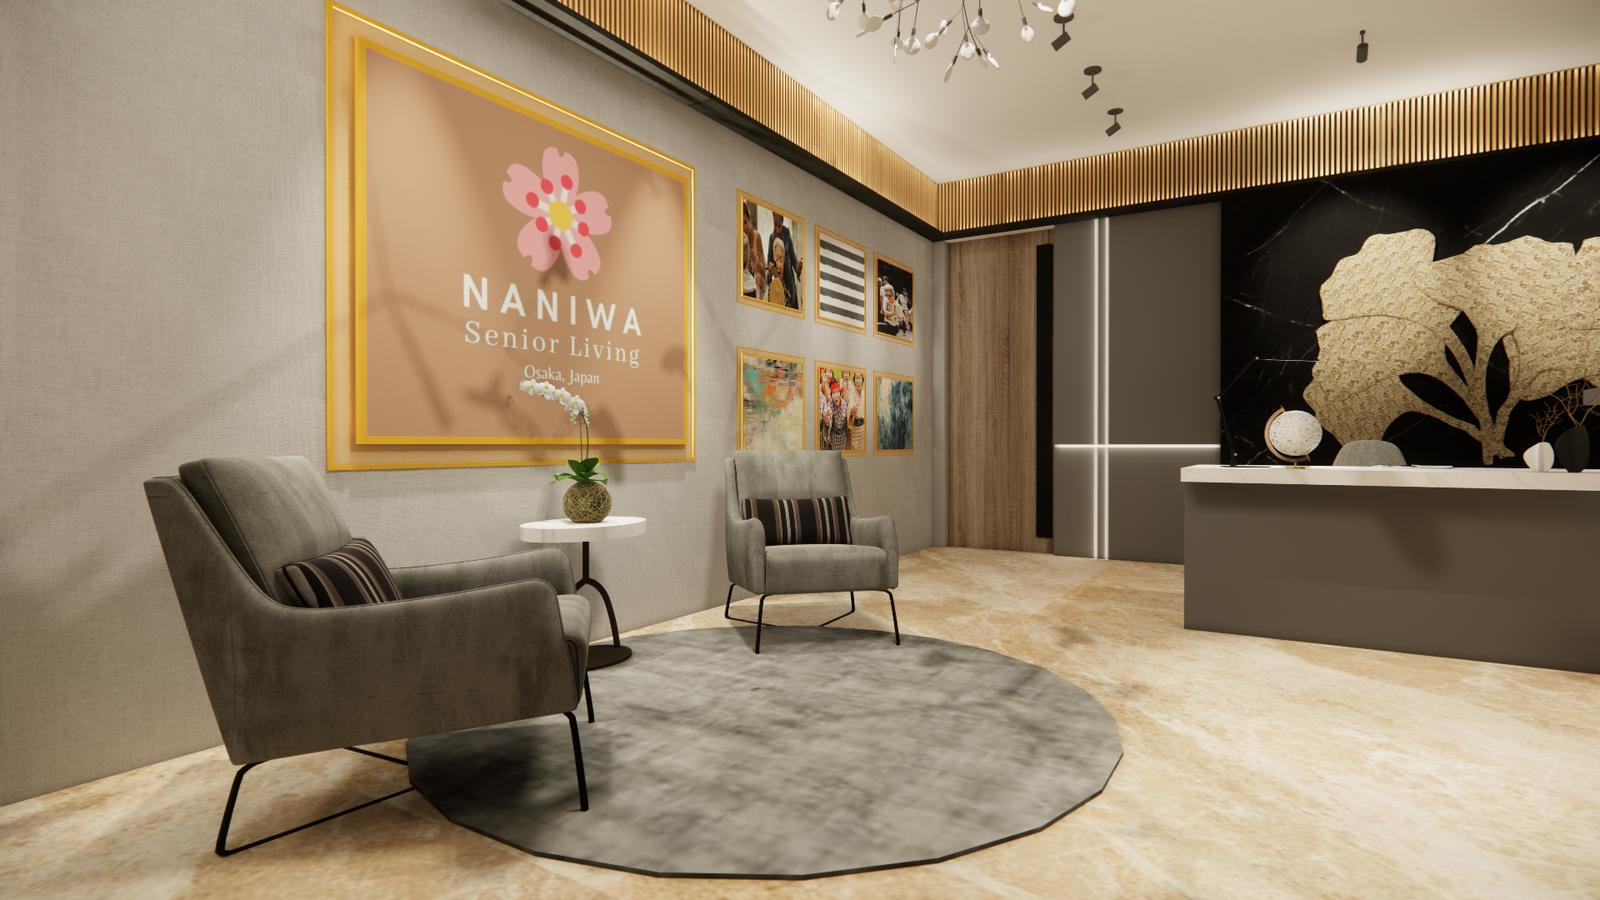 Naniwa Senior Living Center - Lobby 3